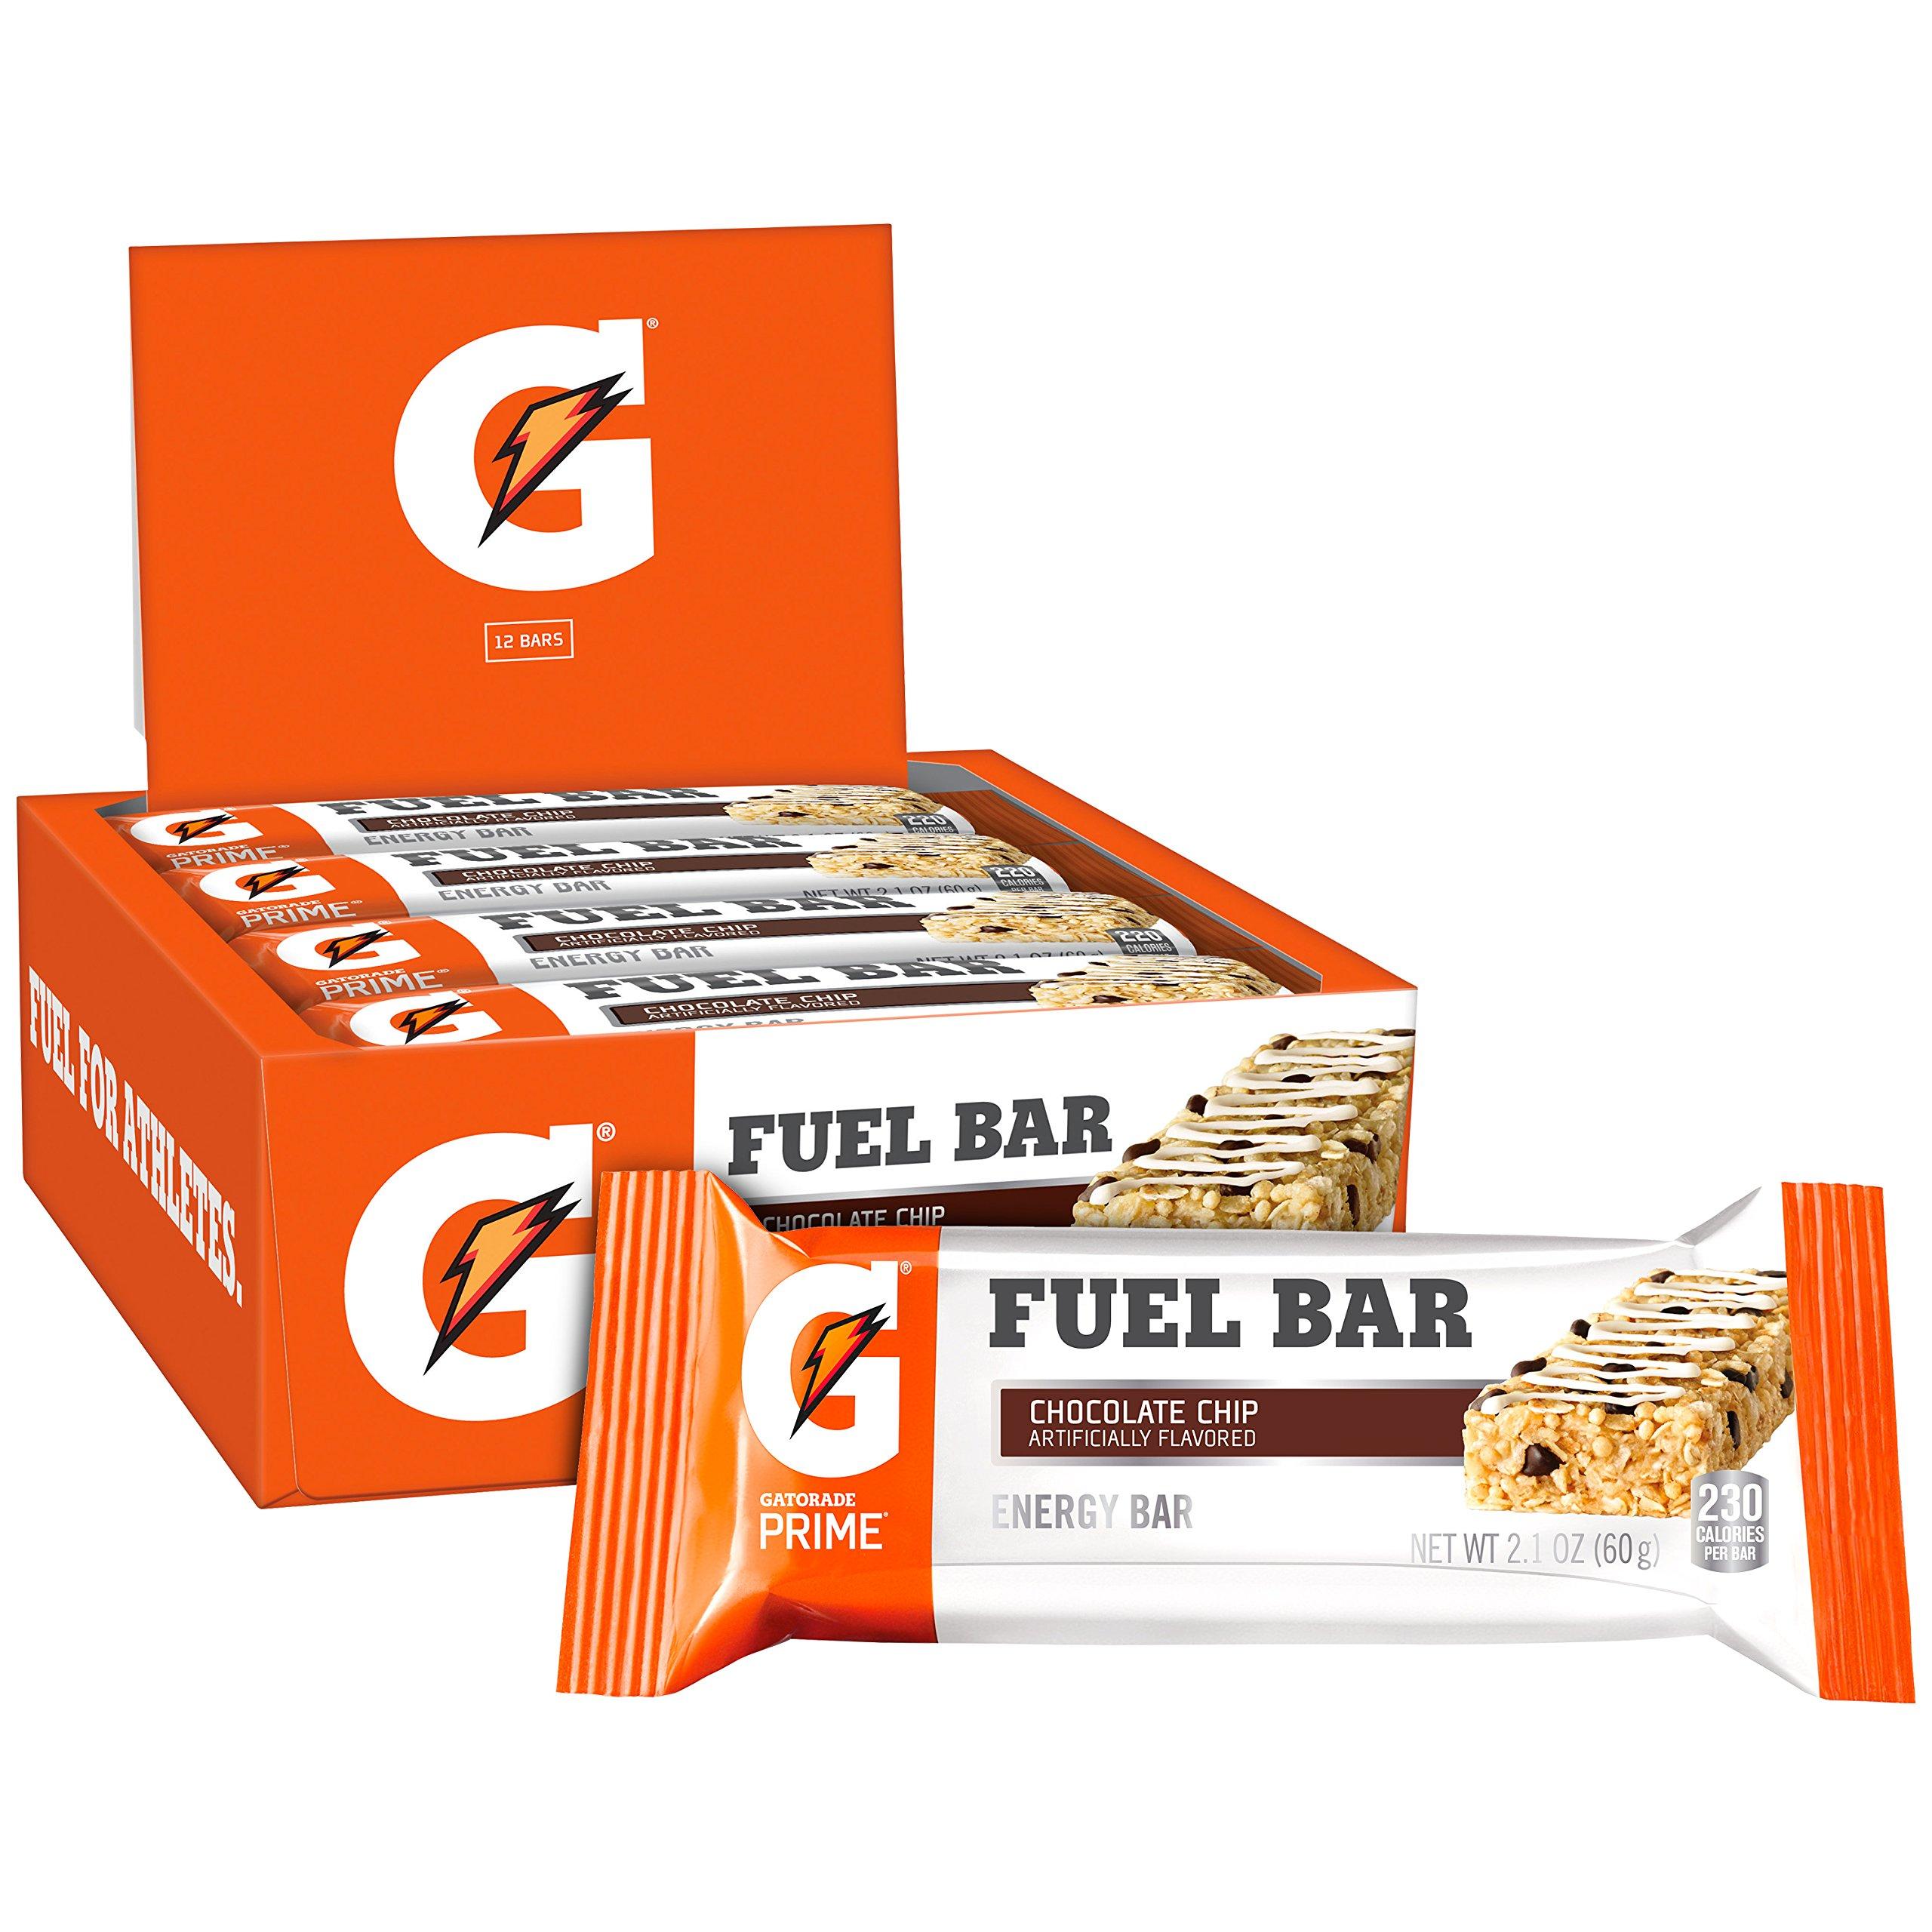 Gatorade Prime Fuel Bar, Chocolate Chip, 45g of carbs, 5g of protein per bar (12 Count), 2.1 oz by Gatorade